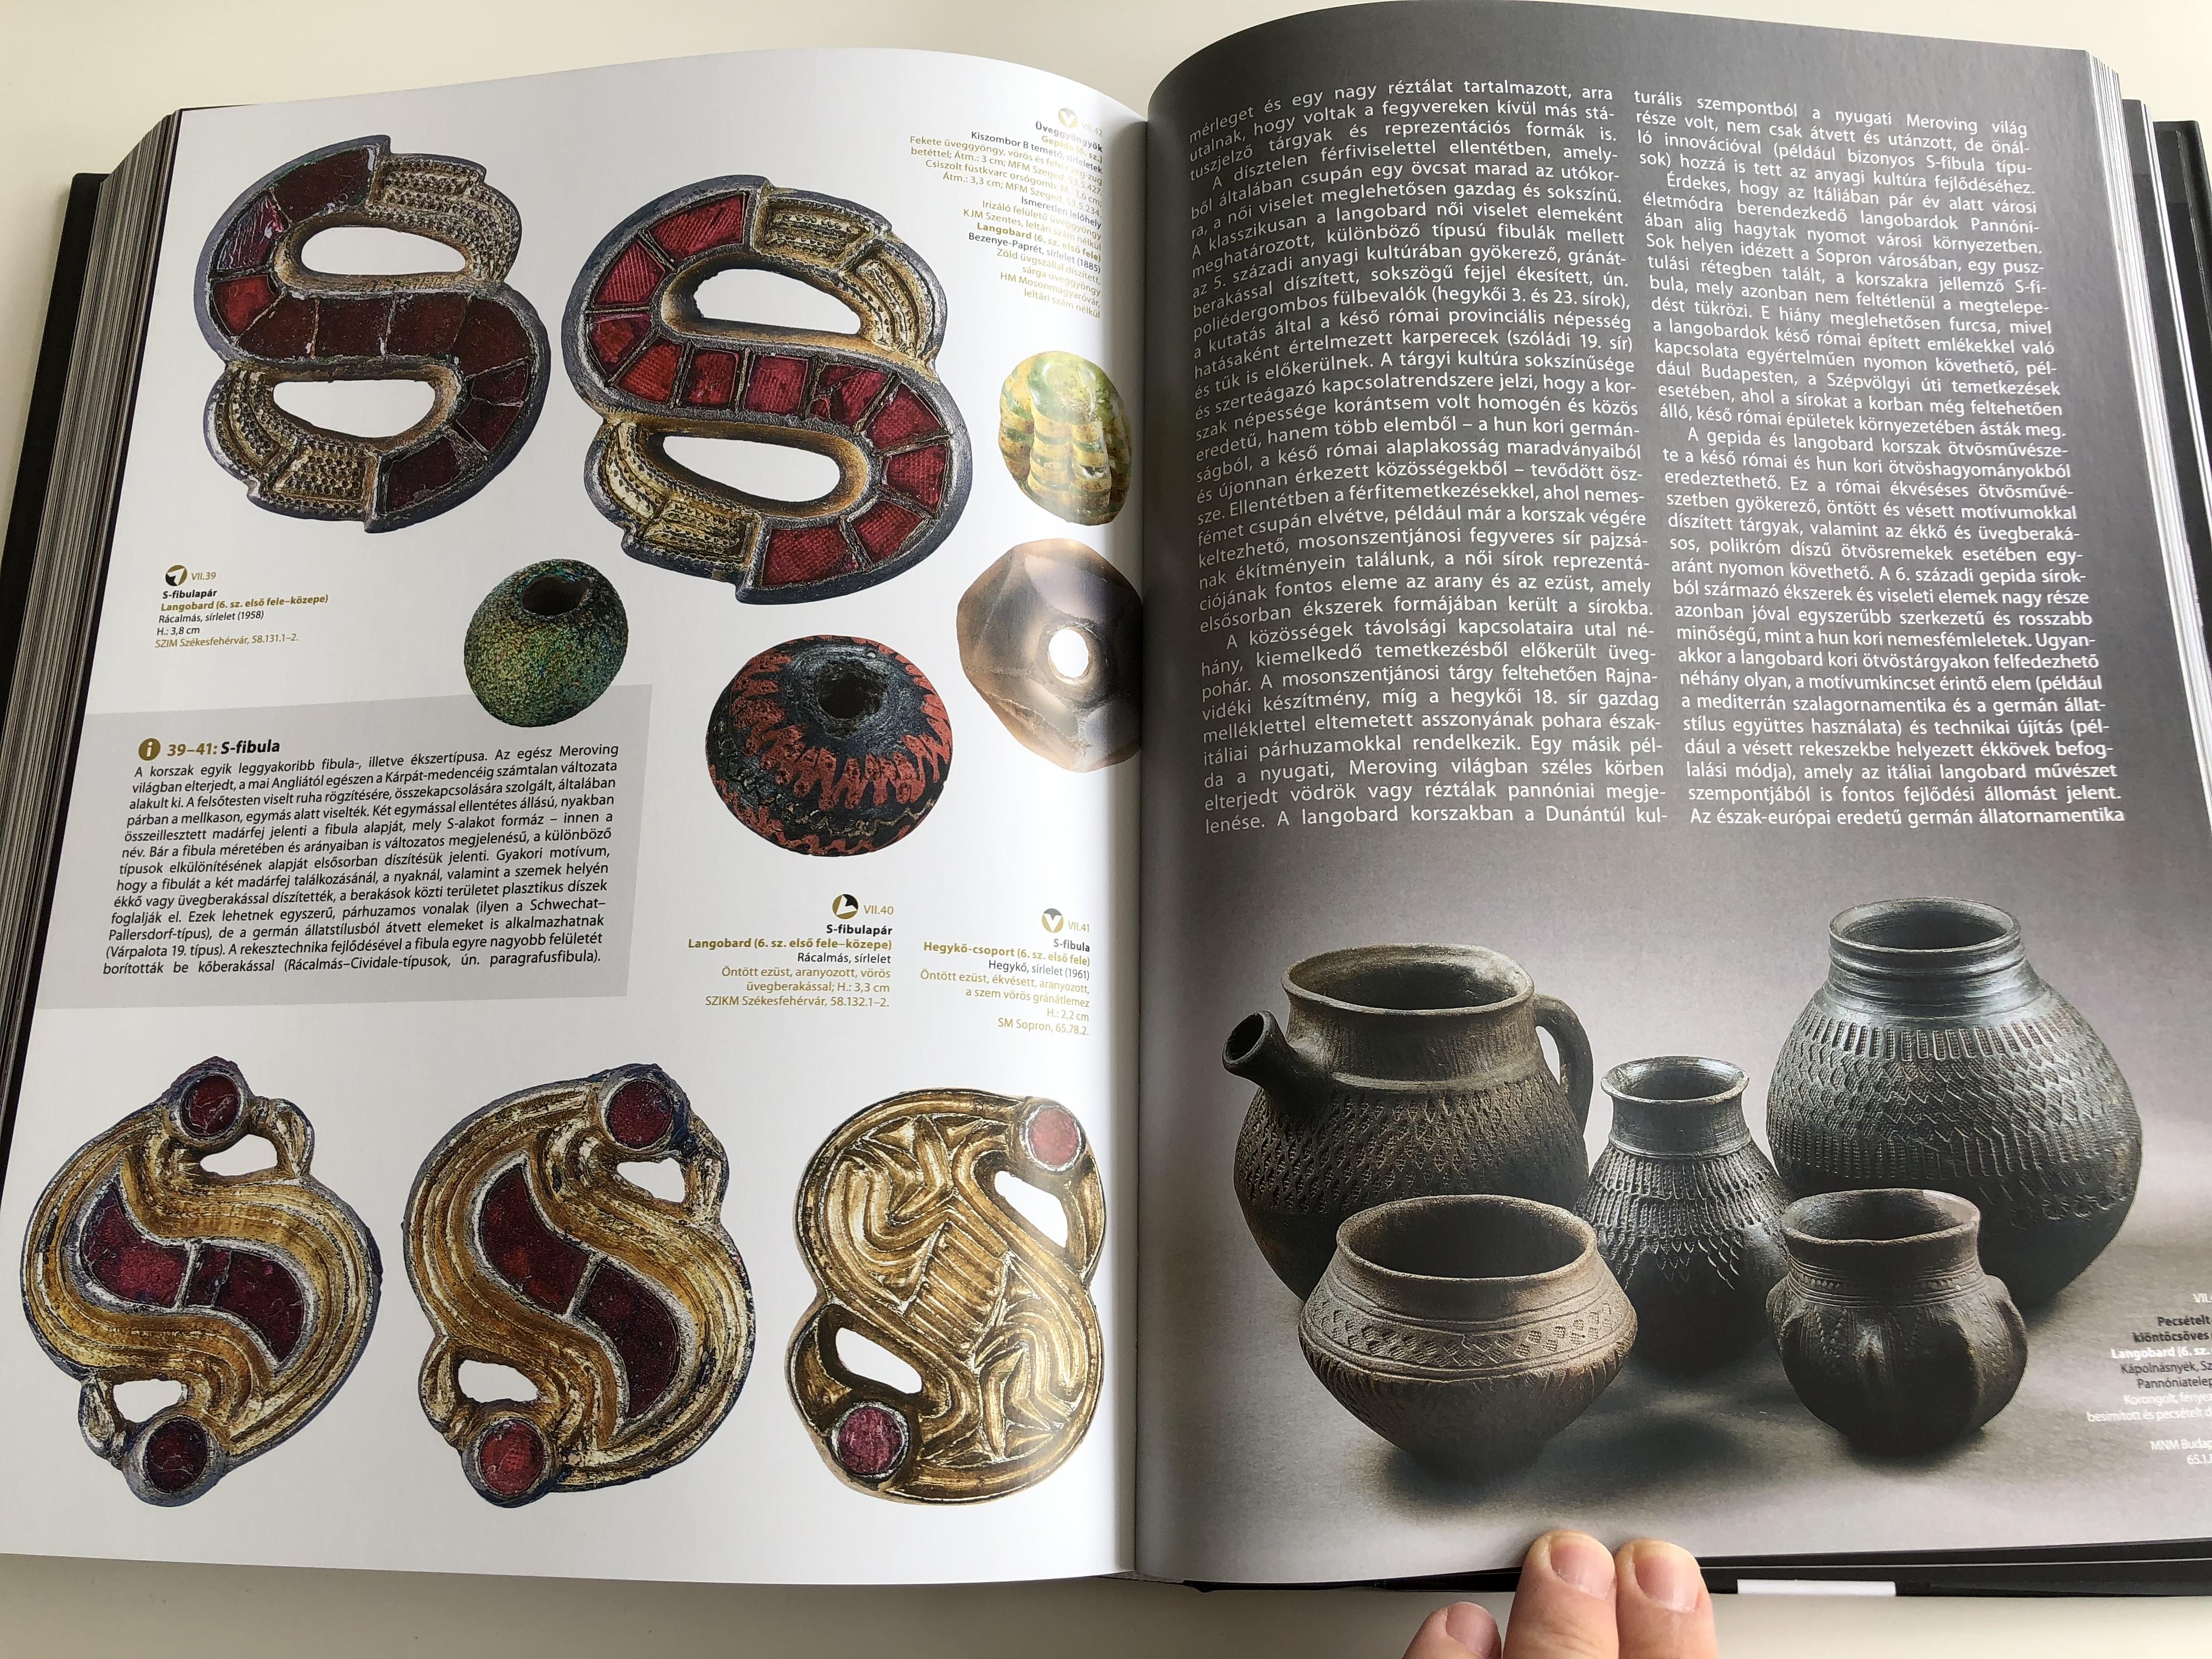 a-k-rp-t-medence-si-kincsei-by-v-g-d-m-a-k-kort-l-a-honfoglal-sig-archeological-treasue-of-the-carpathian-basin-magyar-nemzeti-m-zeum-kossuth-kiad-hardcover-2015-22-.jpg